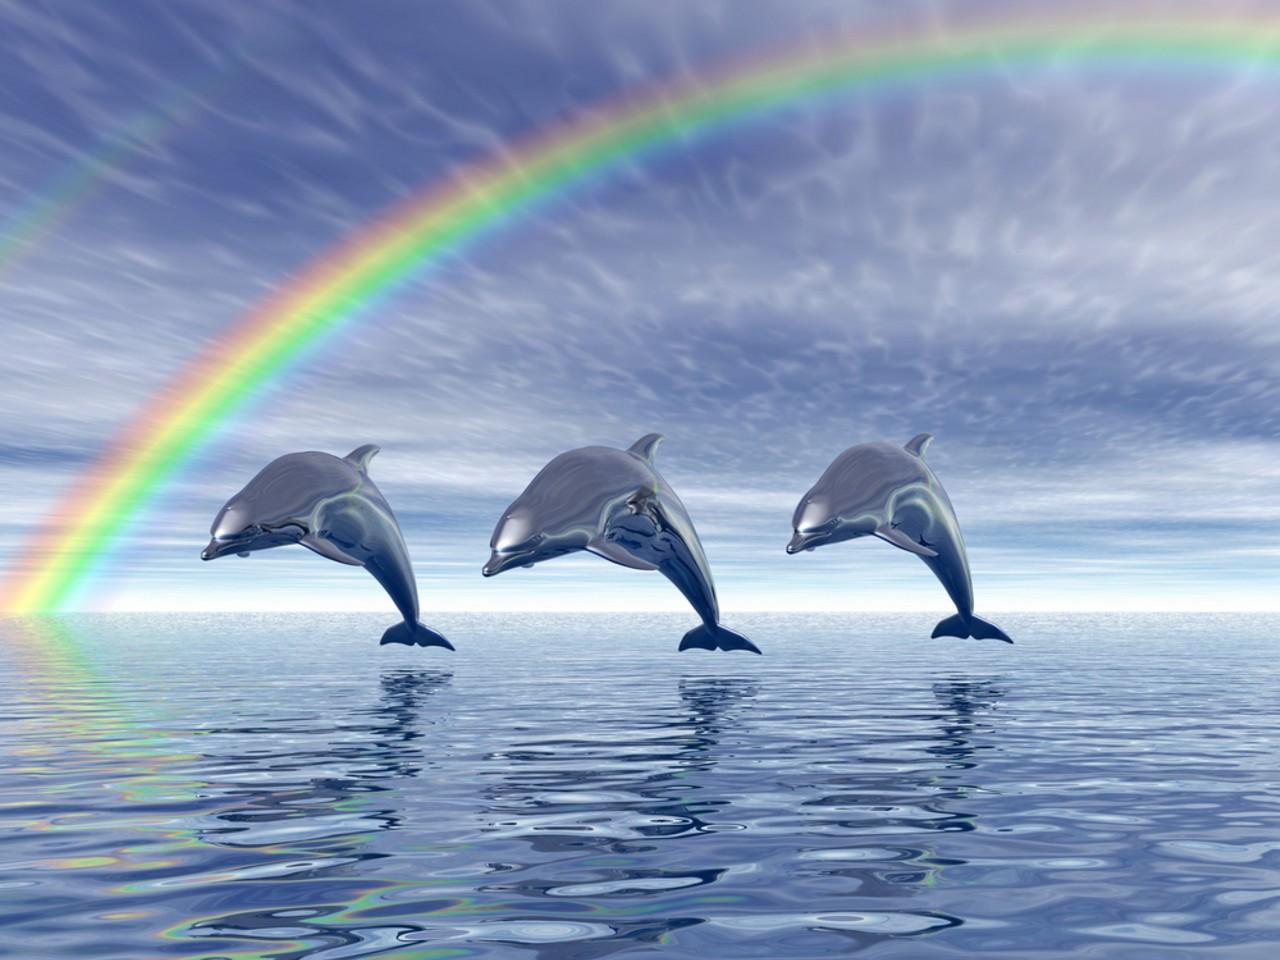 Dolphin Wallpaper wallpaper Dolphin Wallpaper hd wallpaper 1280x960